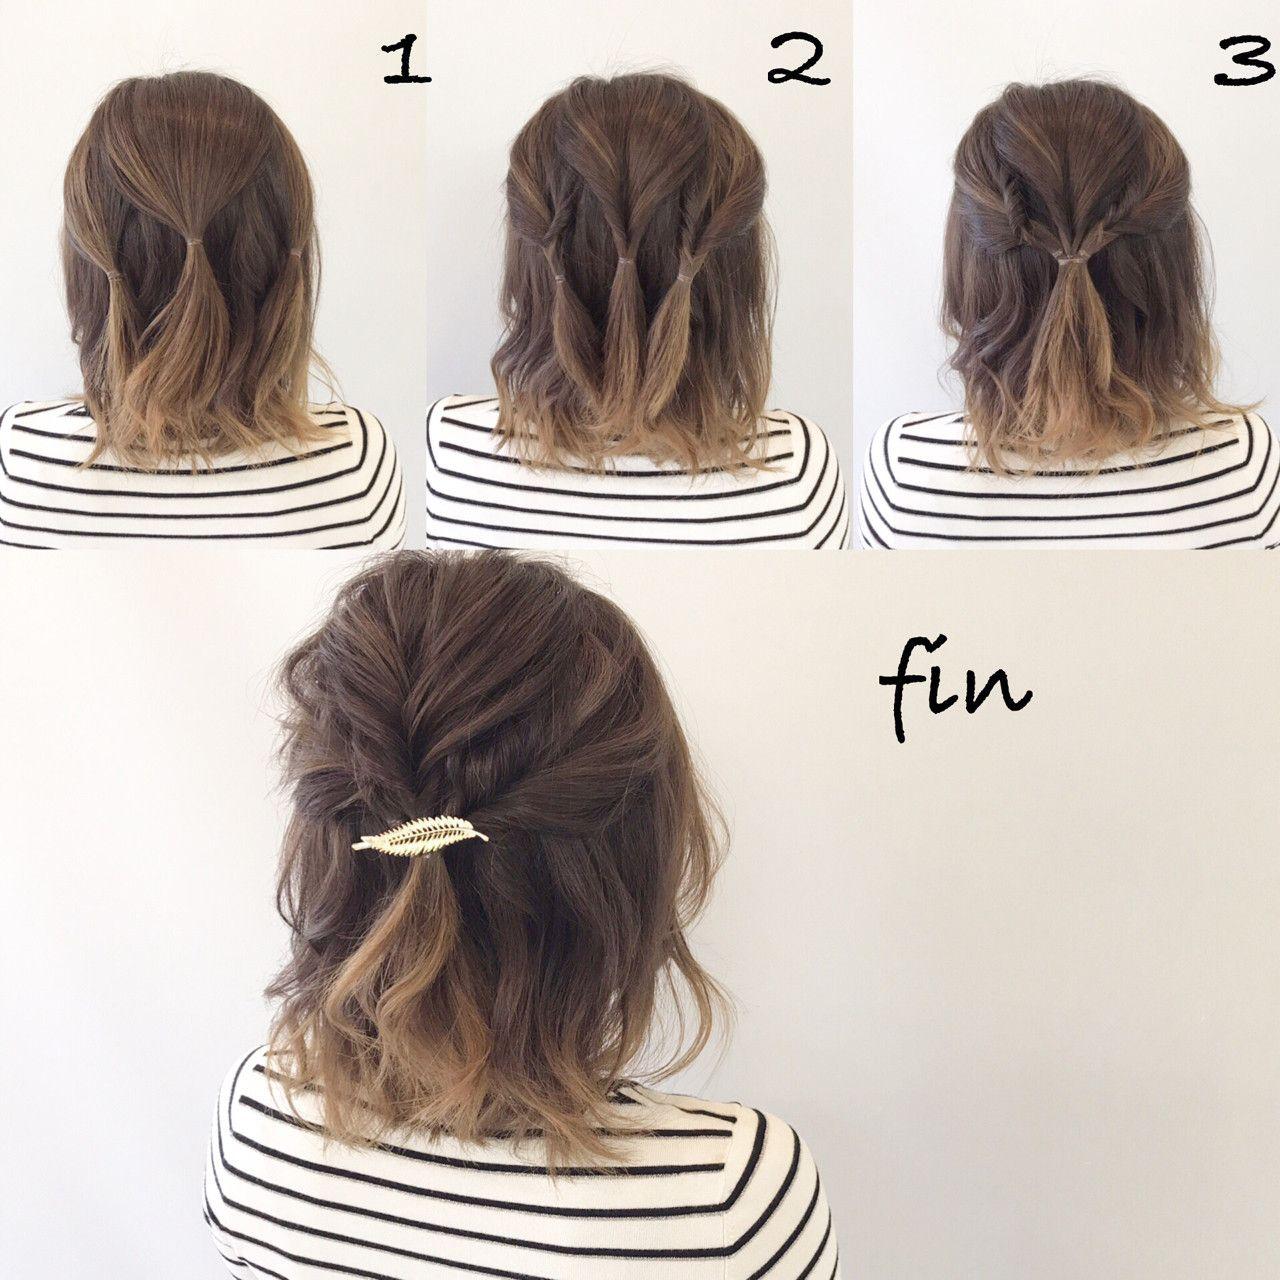 Peinados Despeinados Para Tu Graduacion Peinados Pelo Corto Peinados Poco Cabello Peinados Para Poco Pelo